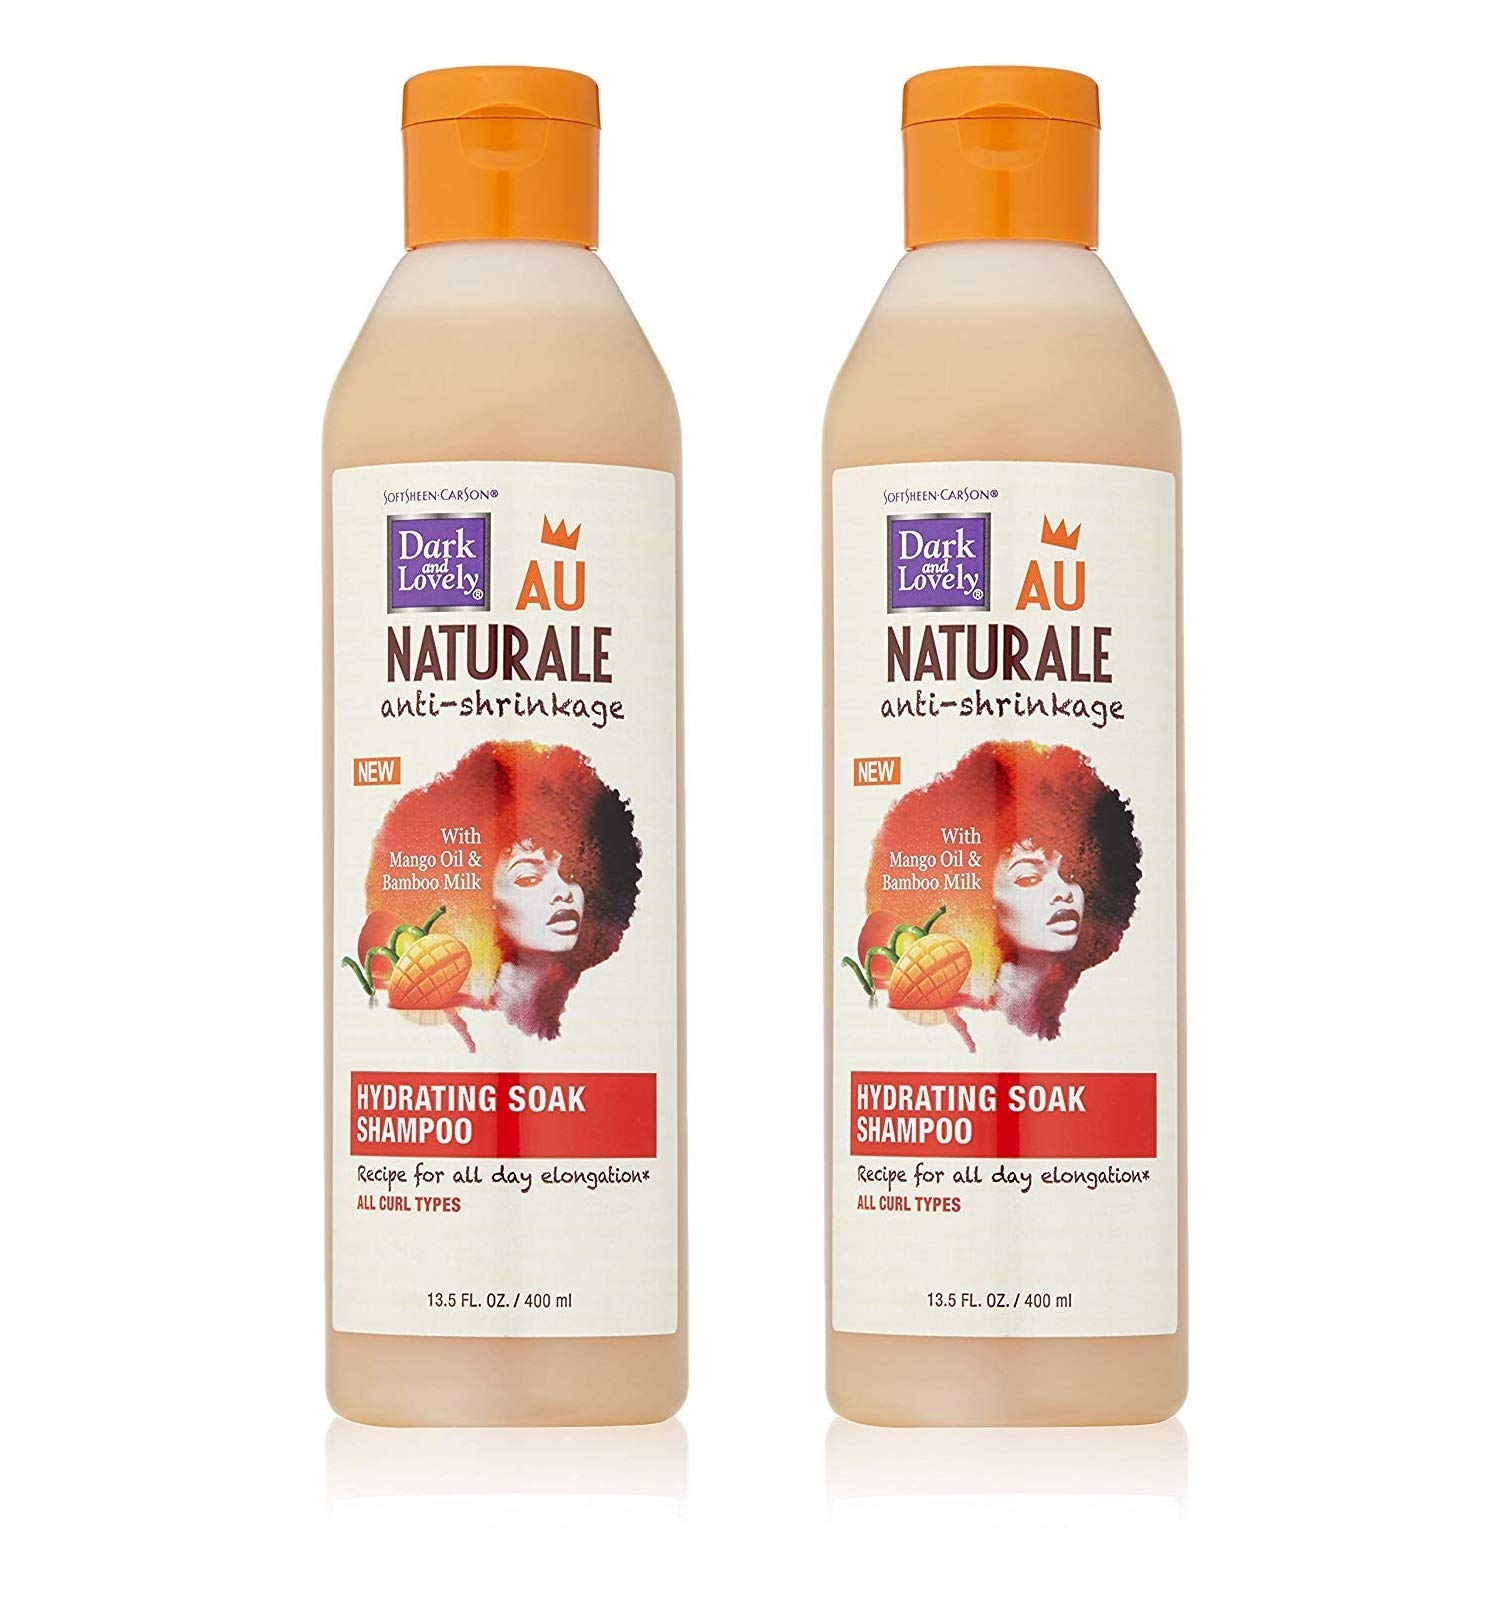 Dark & Lovely Shampoo Au Naturale Hydra+Soak 13.5 Ounce (399ml) (2 Pack)